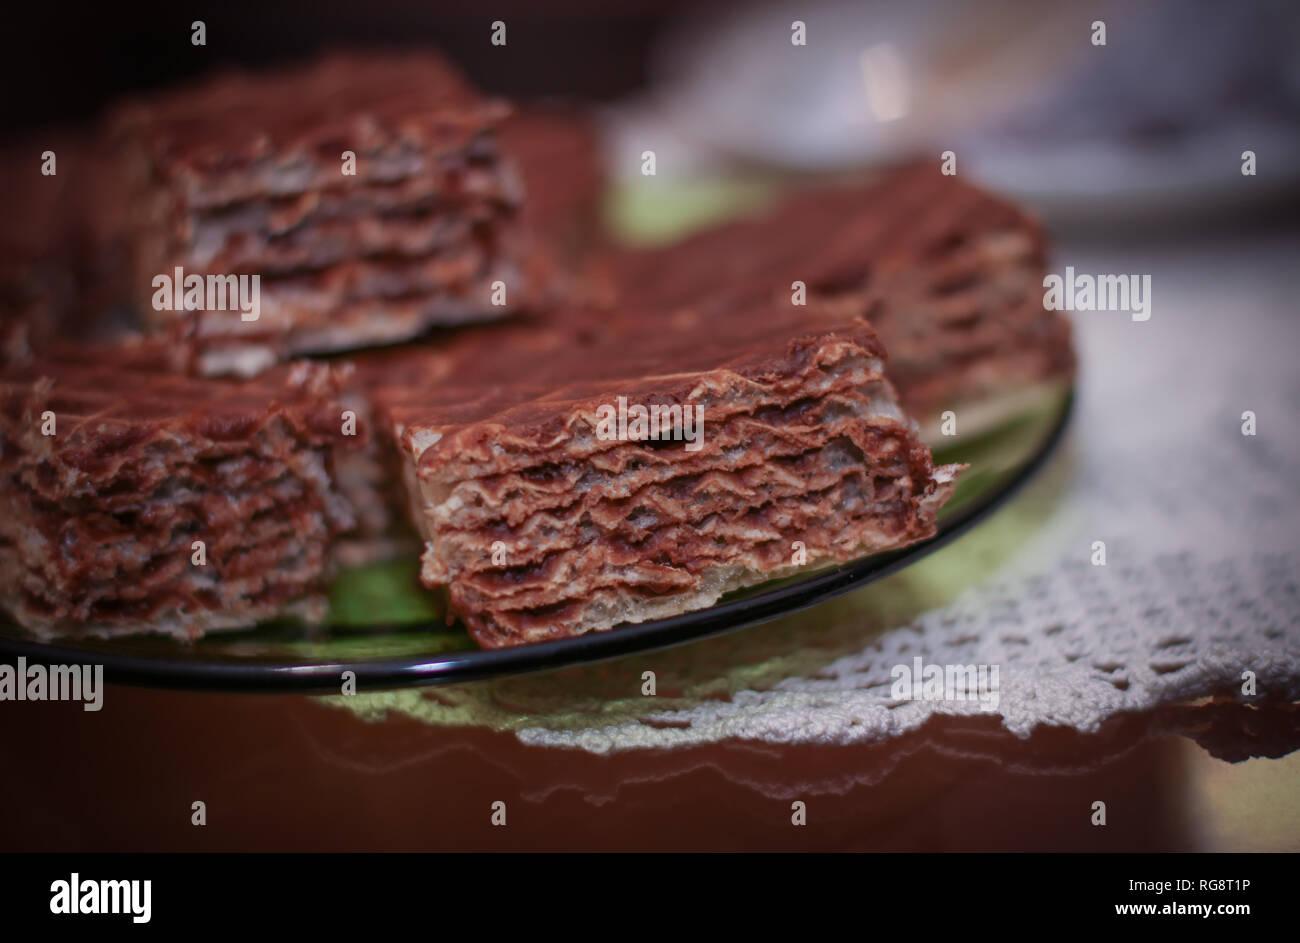 Chocolate layered wafer cake - Stock Image